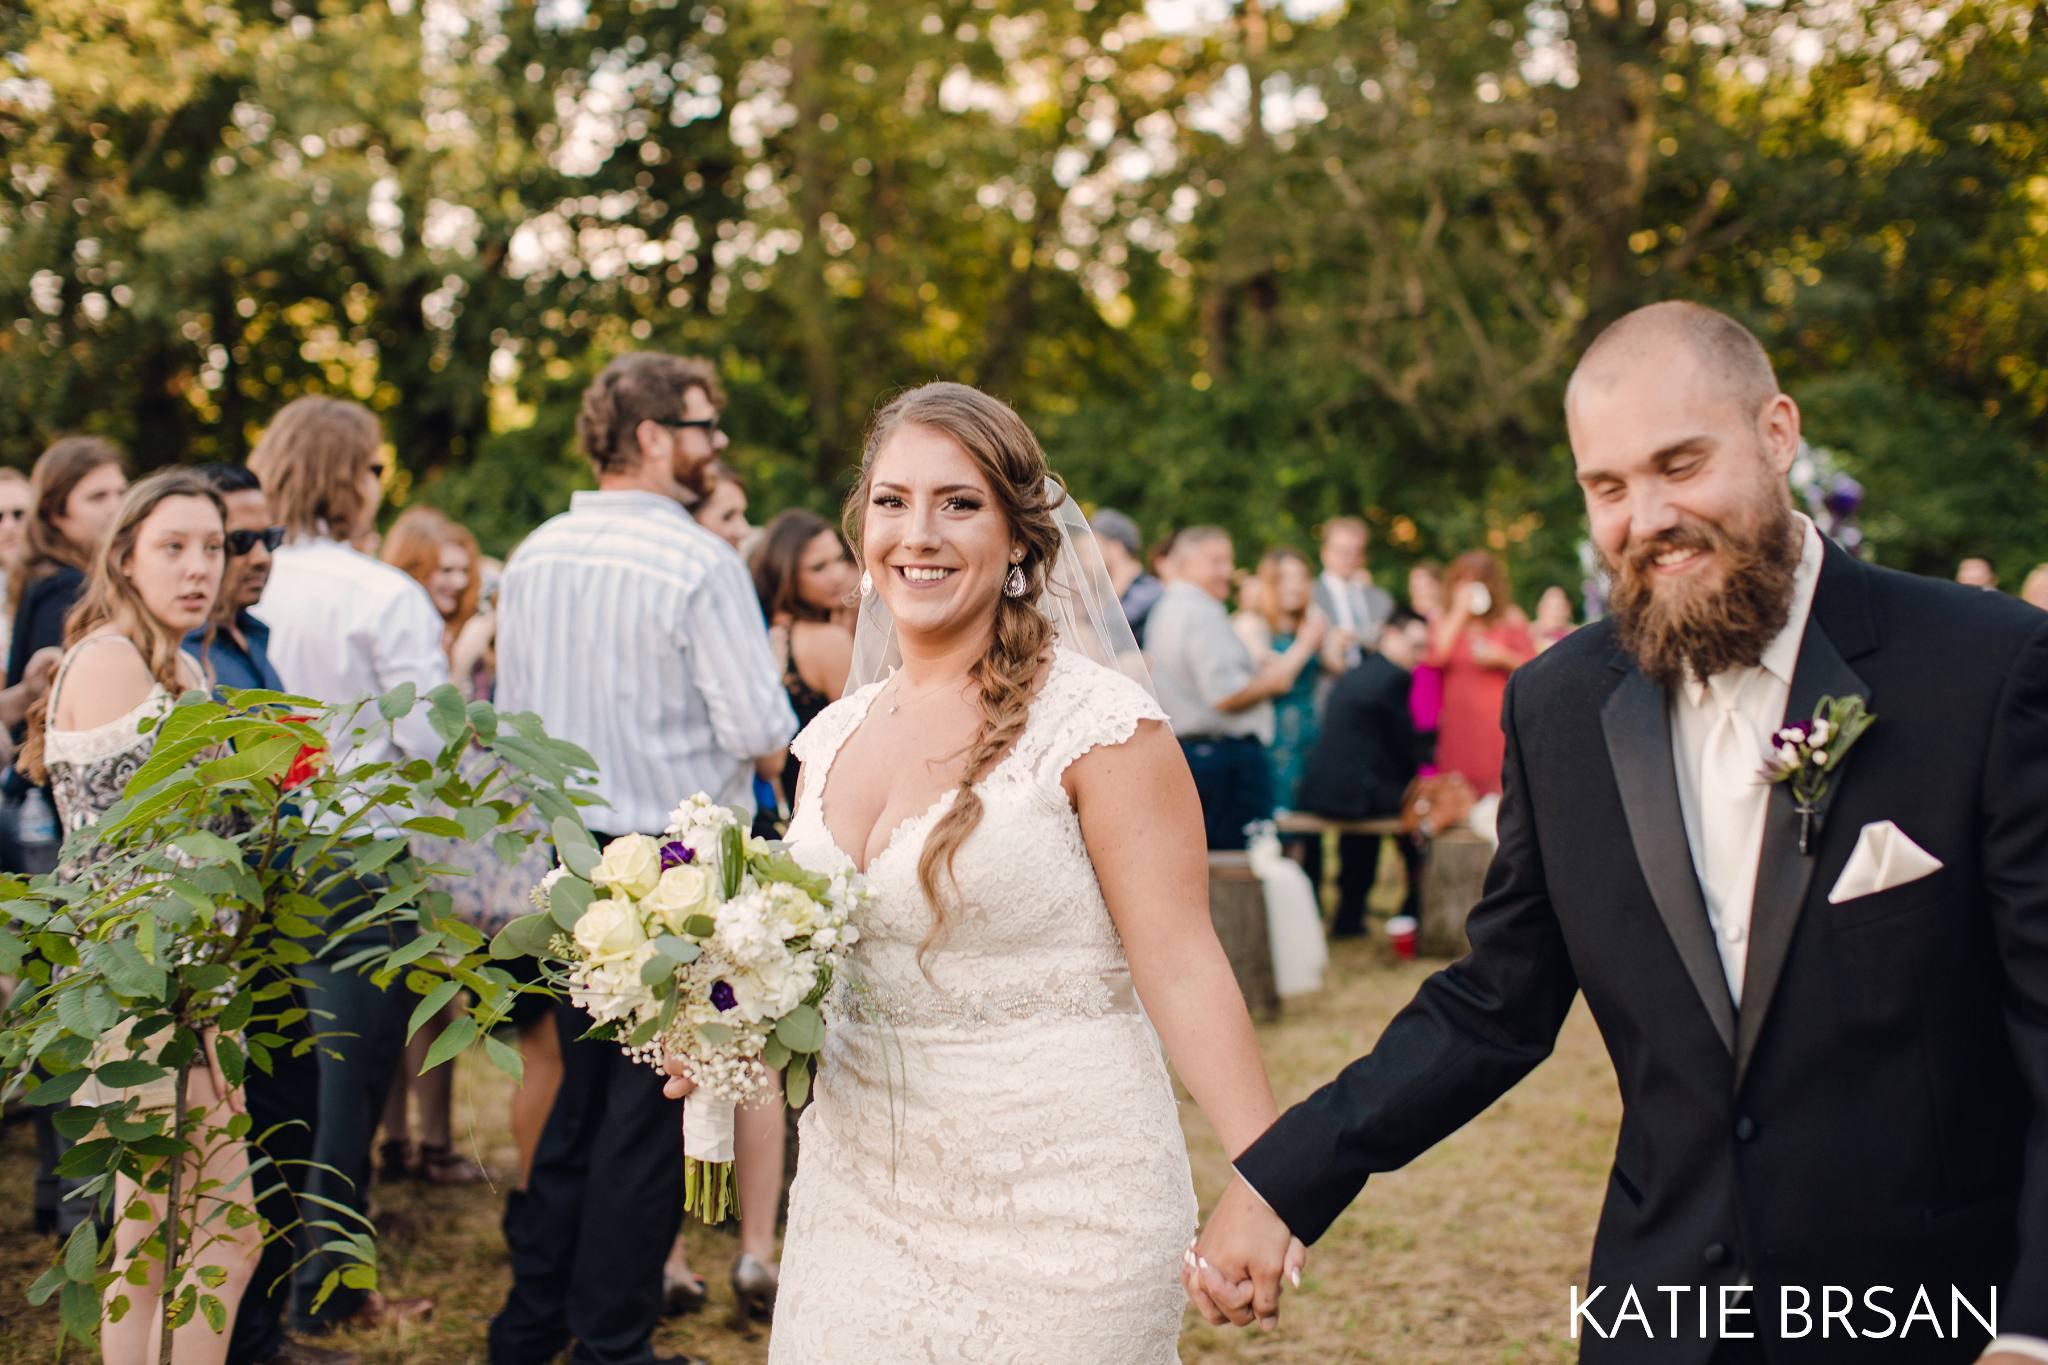 KatieBrsan-Bonfield-Backyard-Wedding_0409.jpg